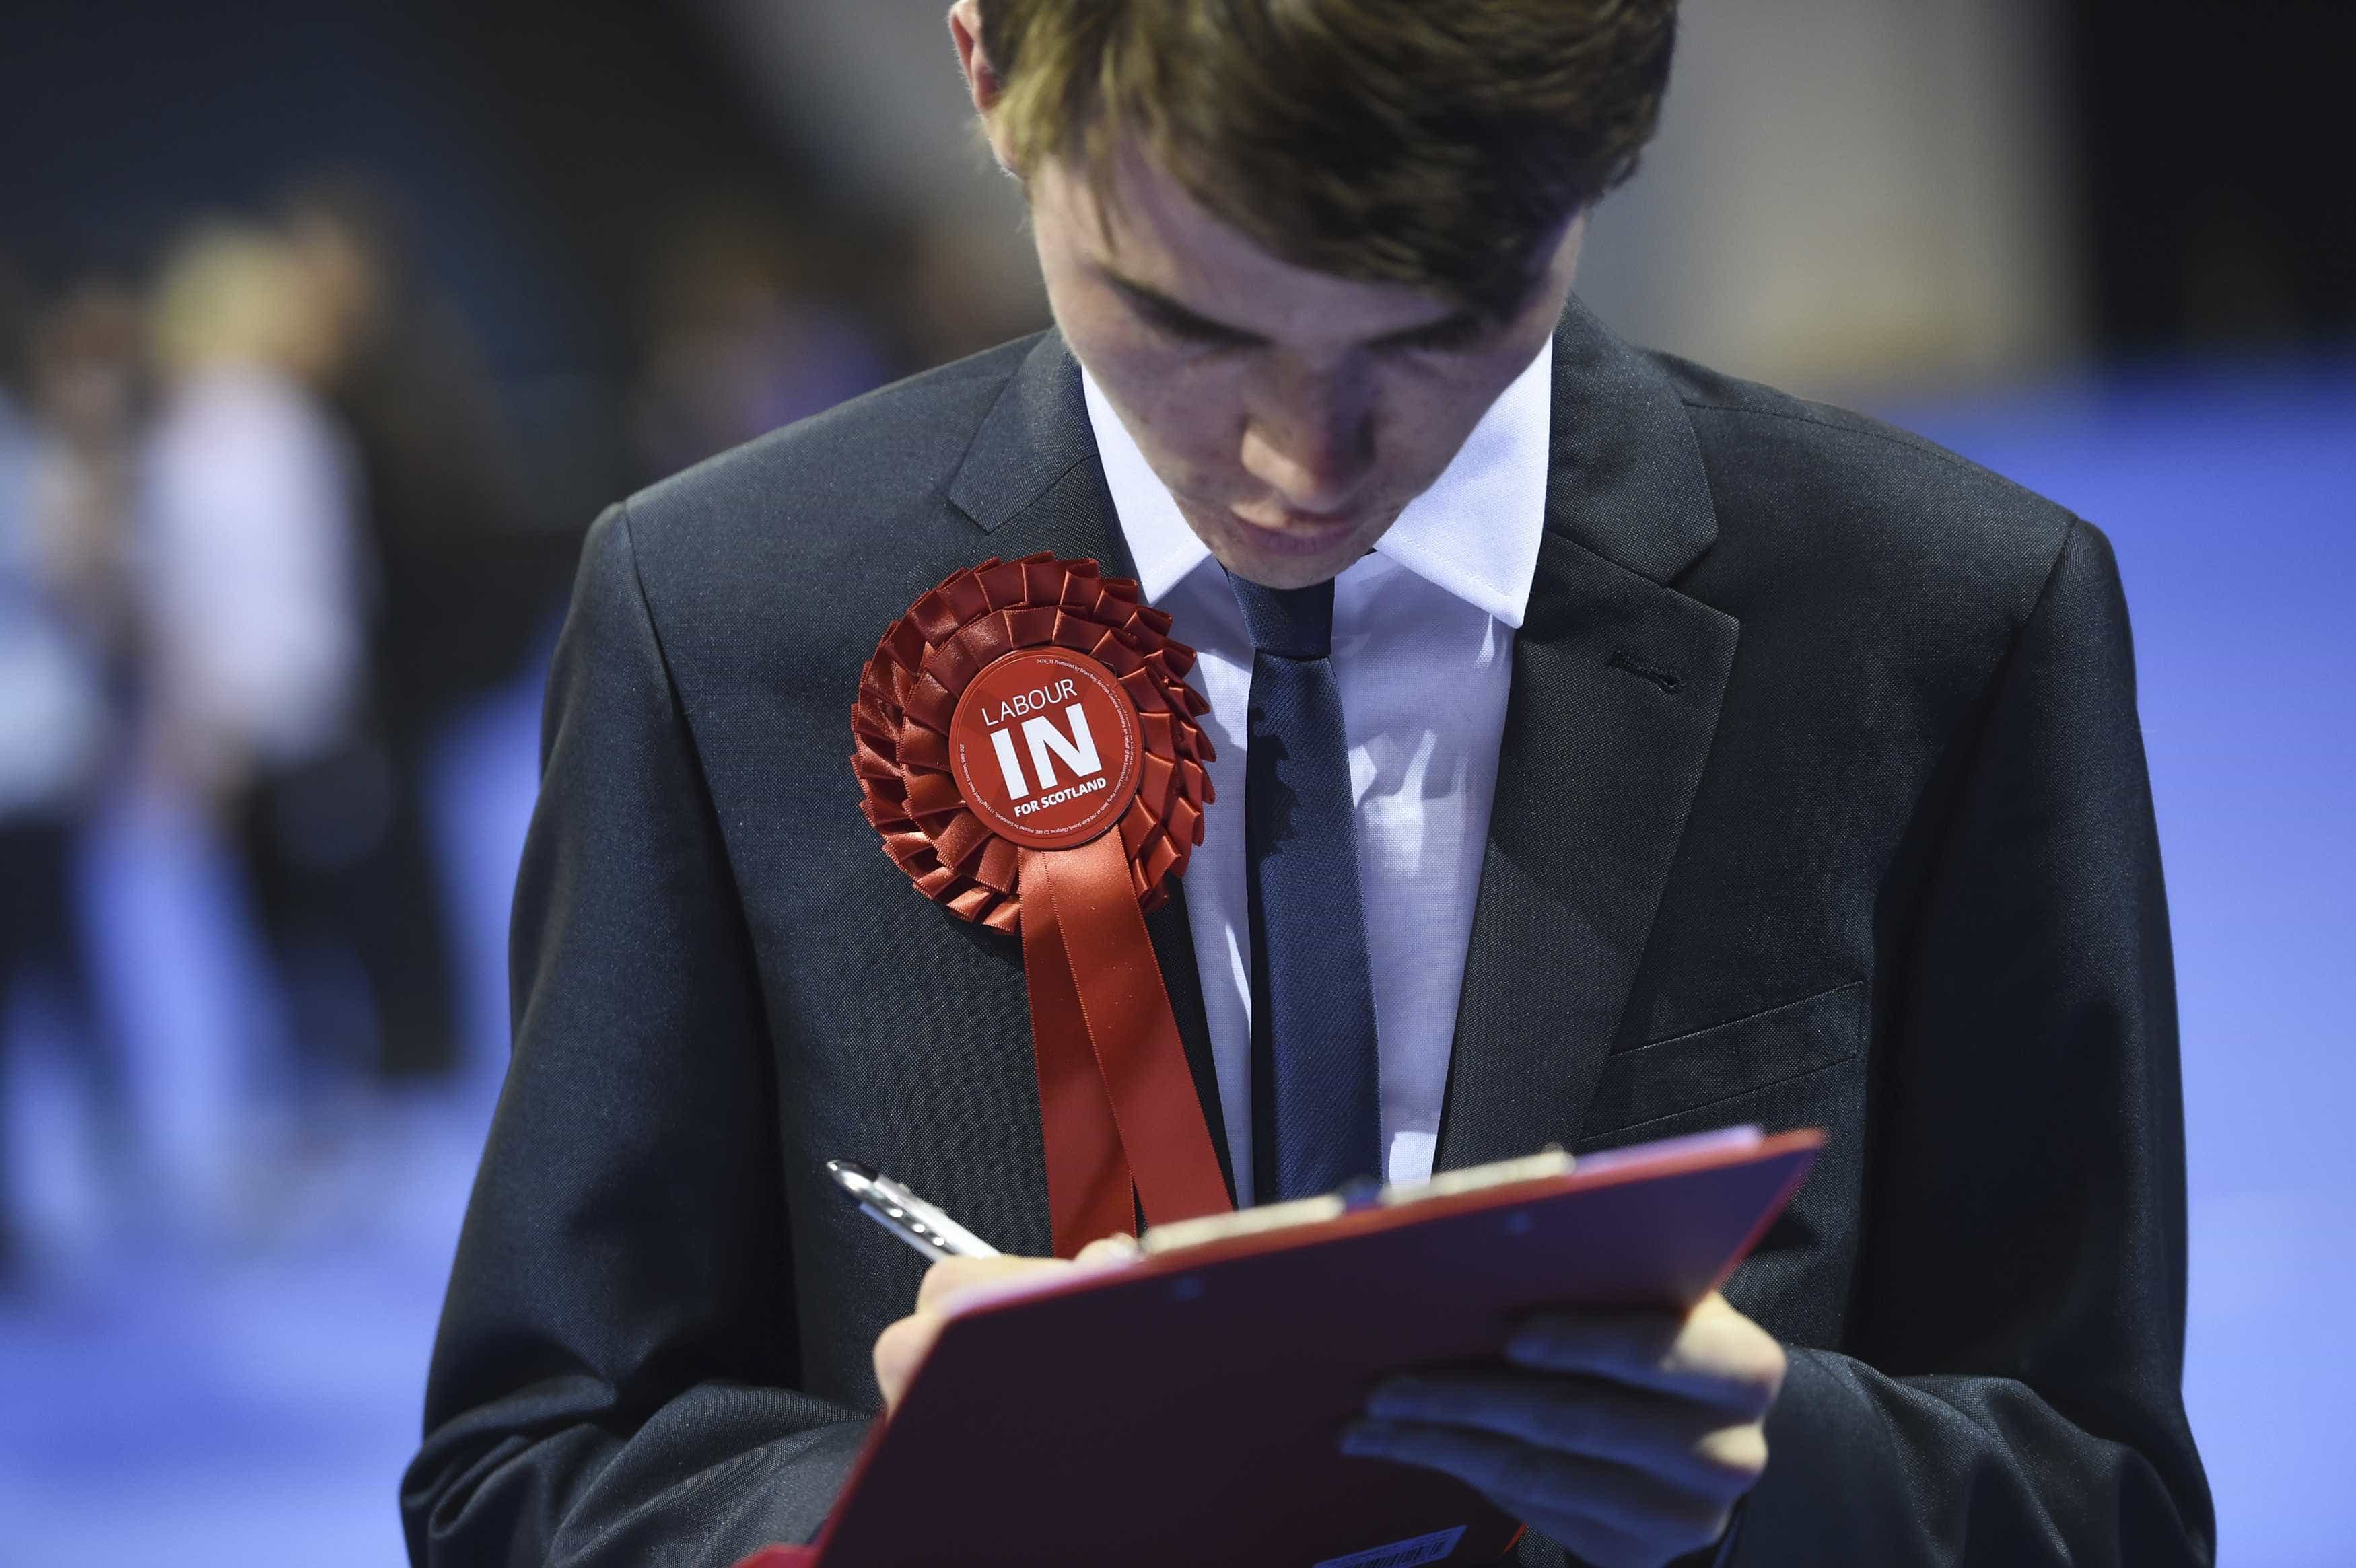 Brexit: Desemprego no Reino Unido cai para 3,9%, mínimo desde 1975